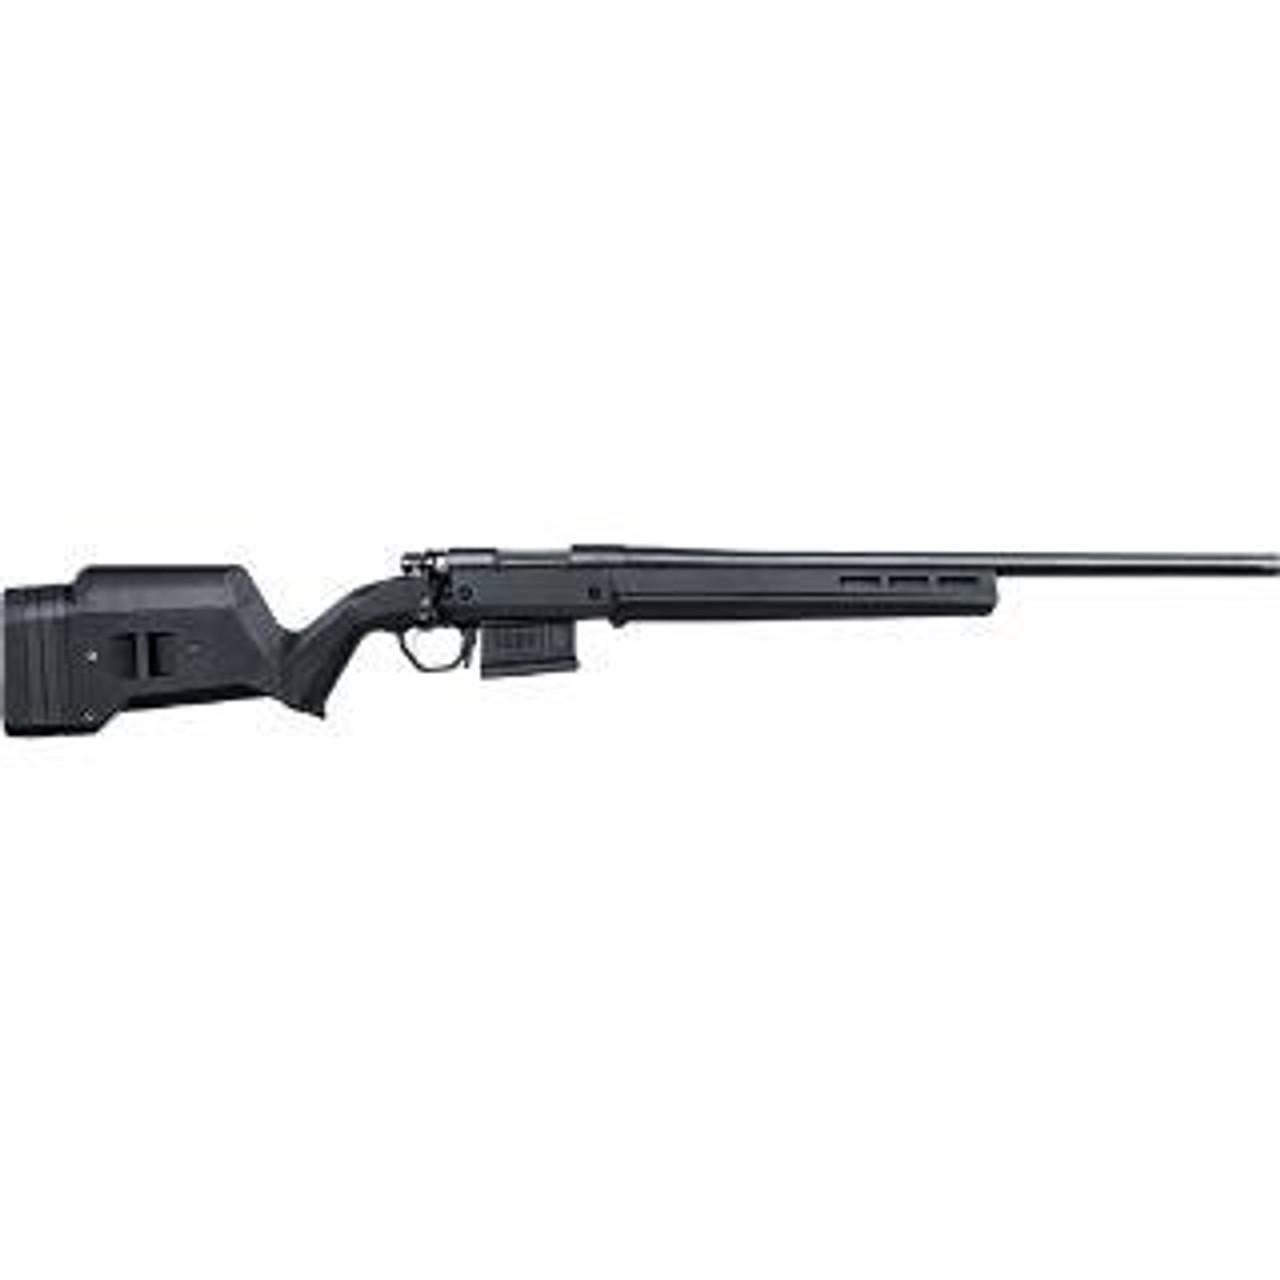 Remington 700 Magpul 22inch Threaded Barrel CALIFORNIA LEGAL - .308